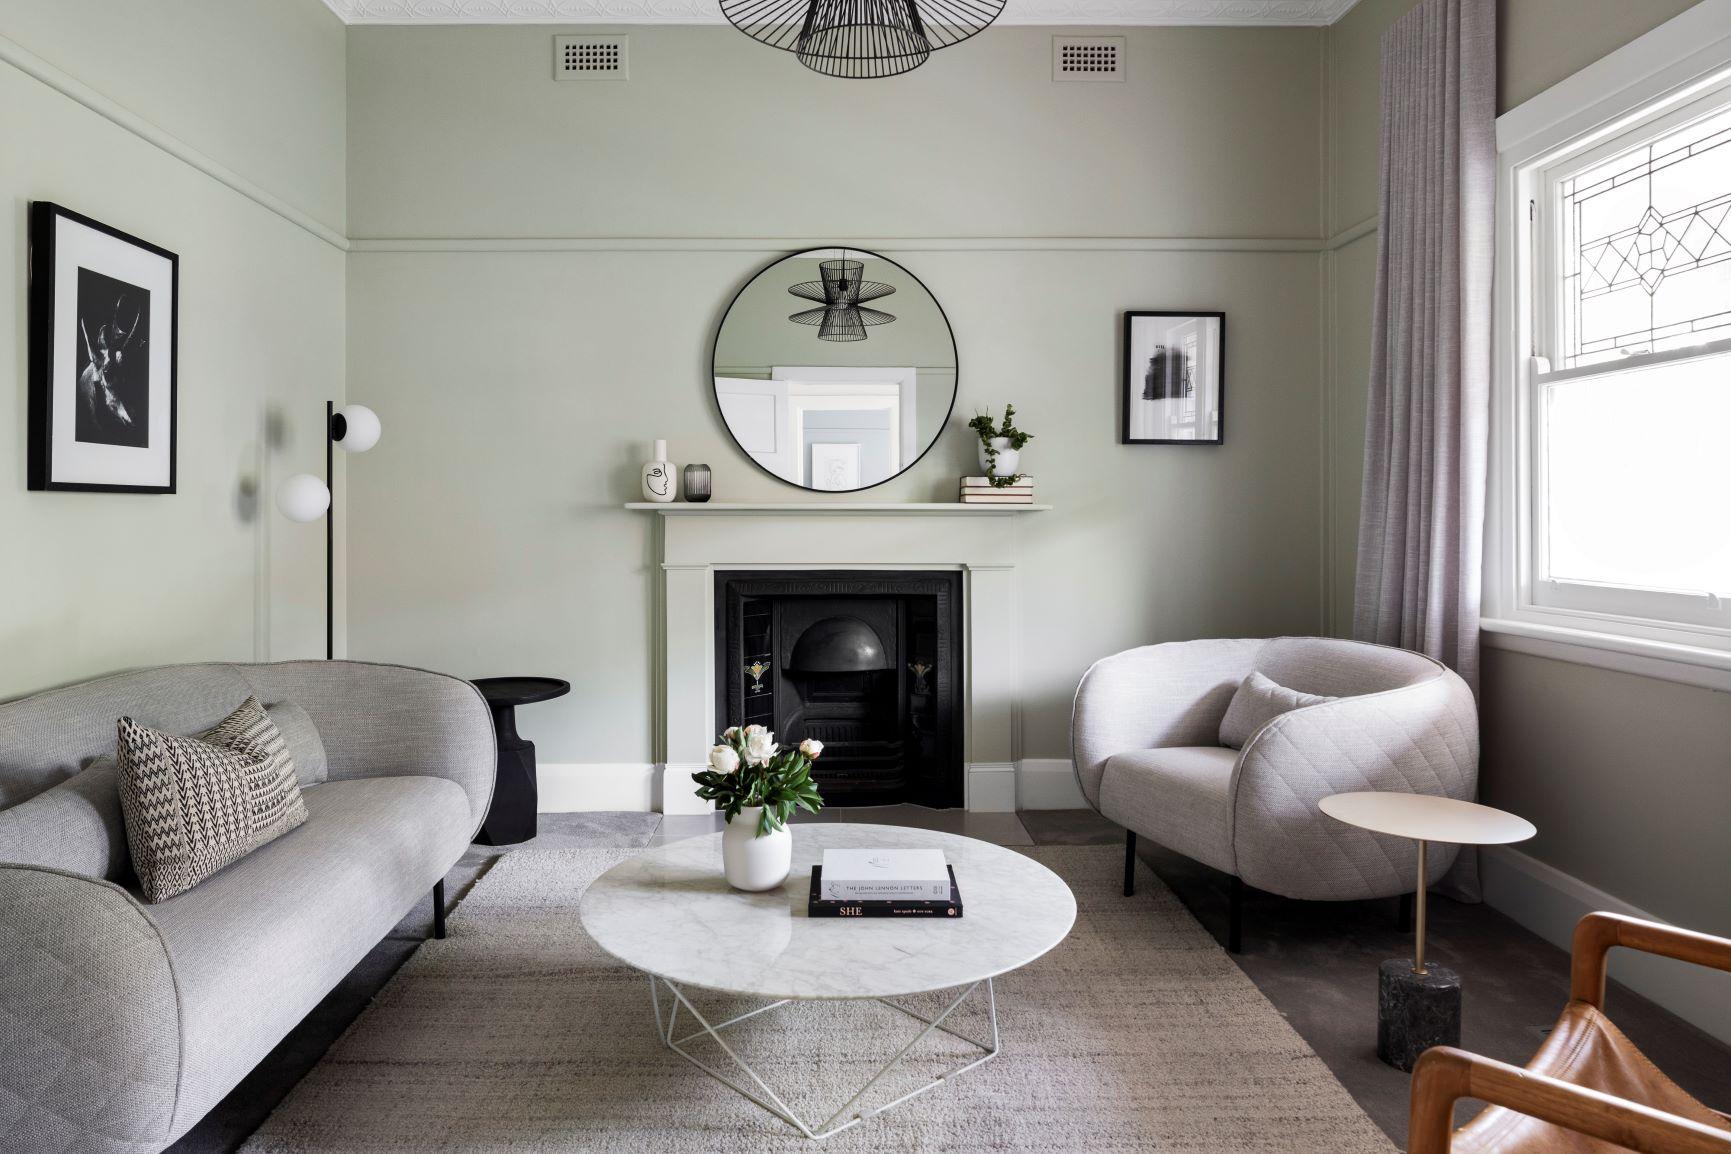 Robert Street Project - Modern House - Lounge Room